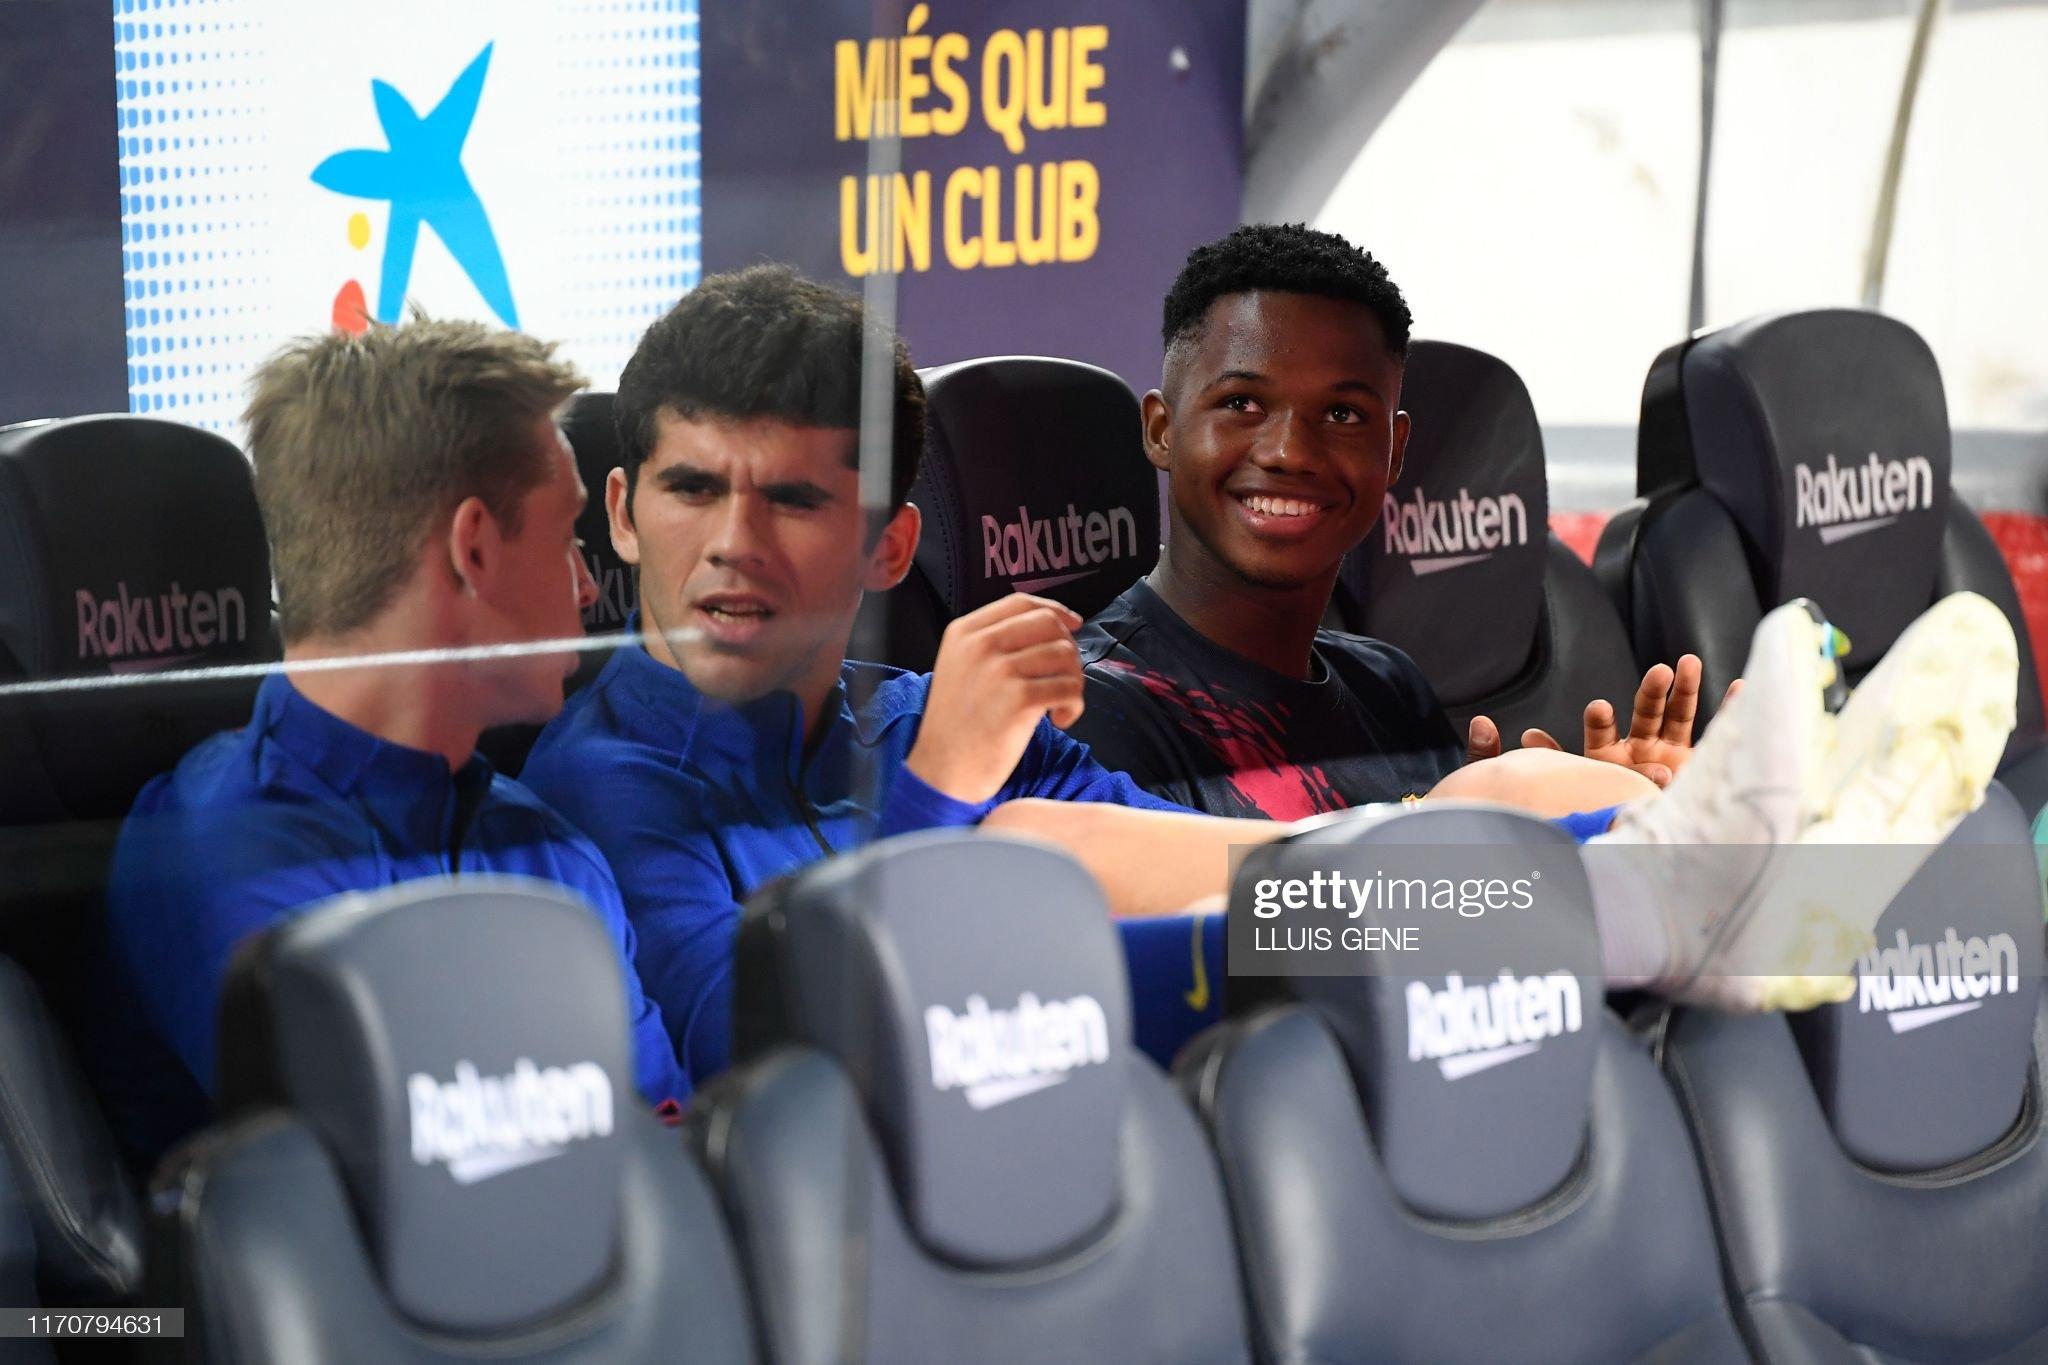 صور مباراة : برشلونة - فياريال 2-1 ( 24-09-2019 )  Barcelonas-spanish-midfielder-carles-alena-and-barcelonas-forward-picture-id1170794631?s=2048x2048